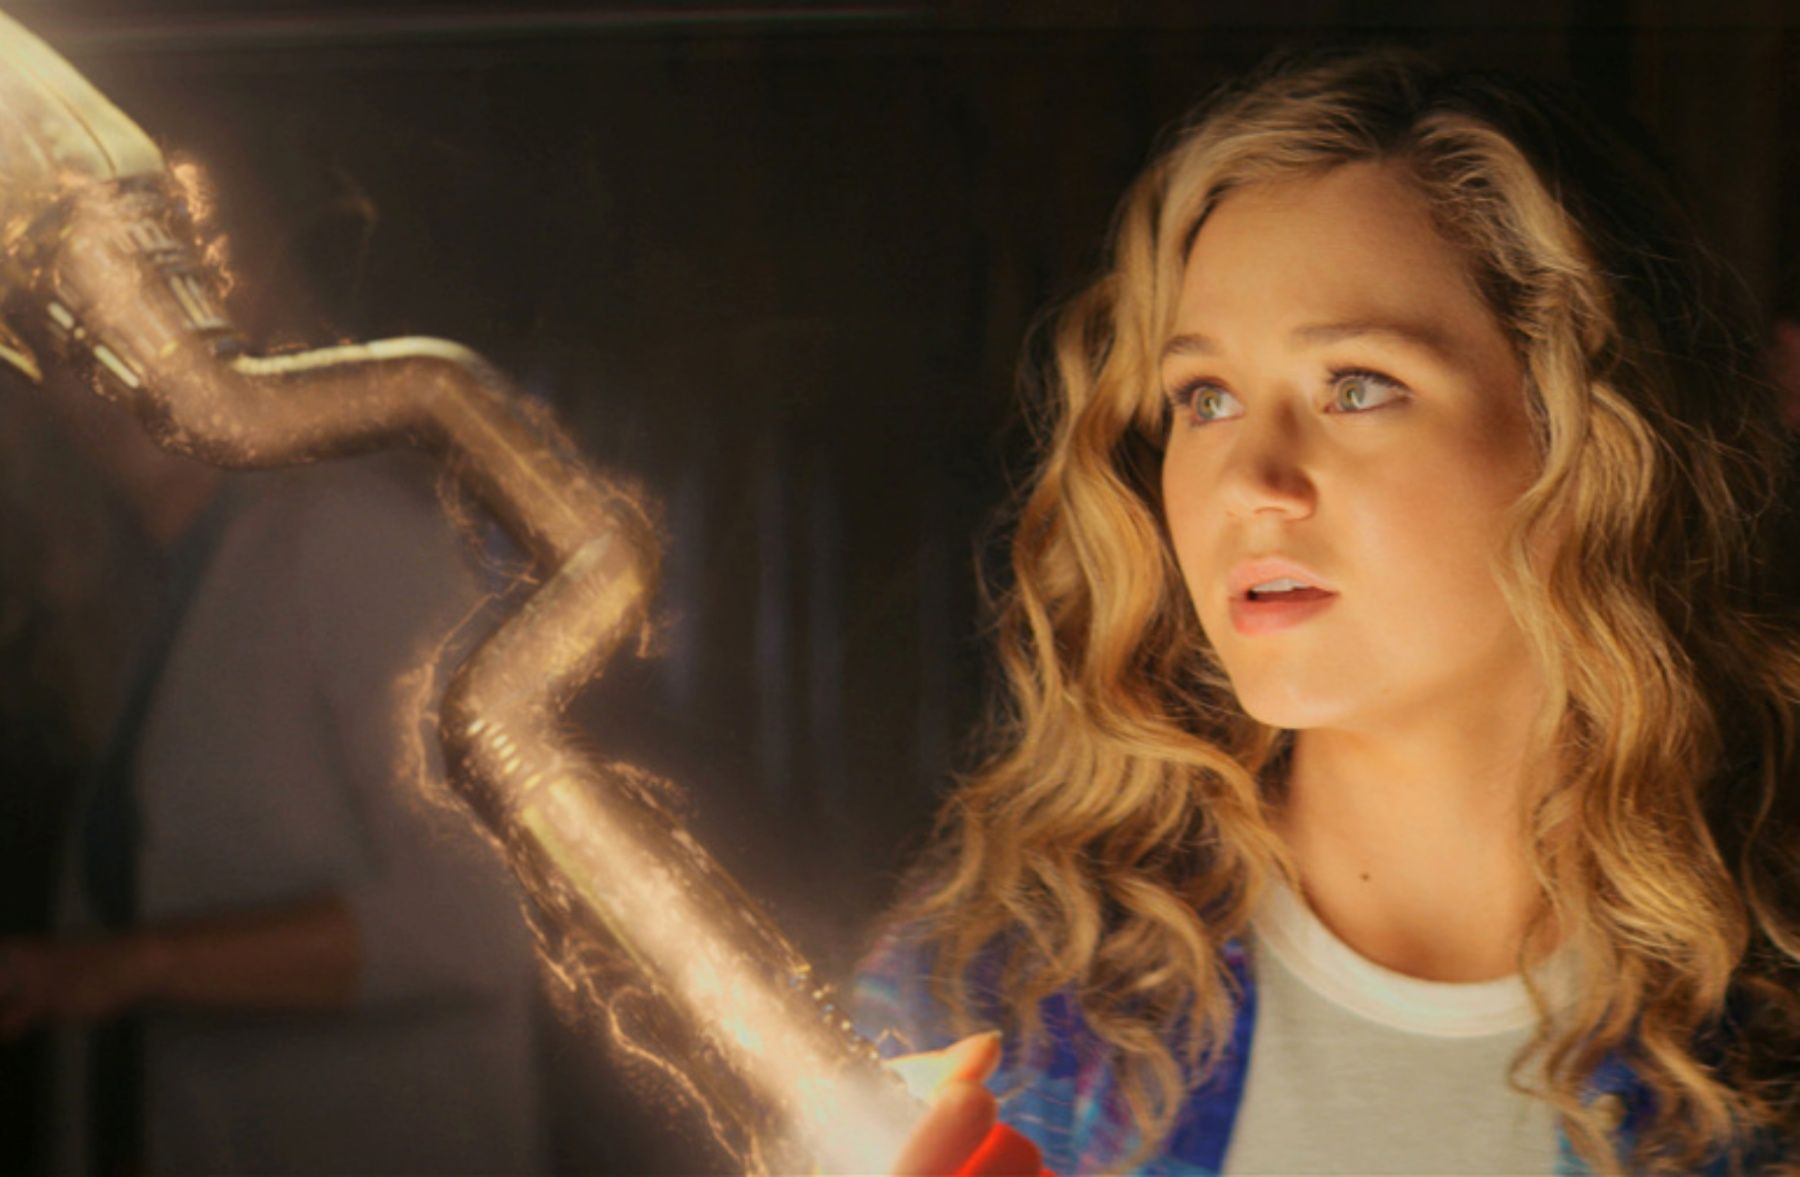 Stargirl: Brec Bassinger on Getting a Season 2 on The CW | Collider